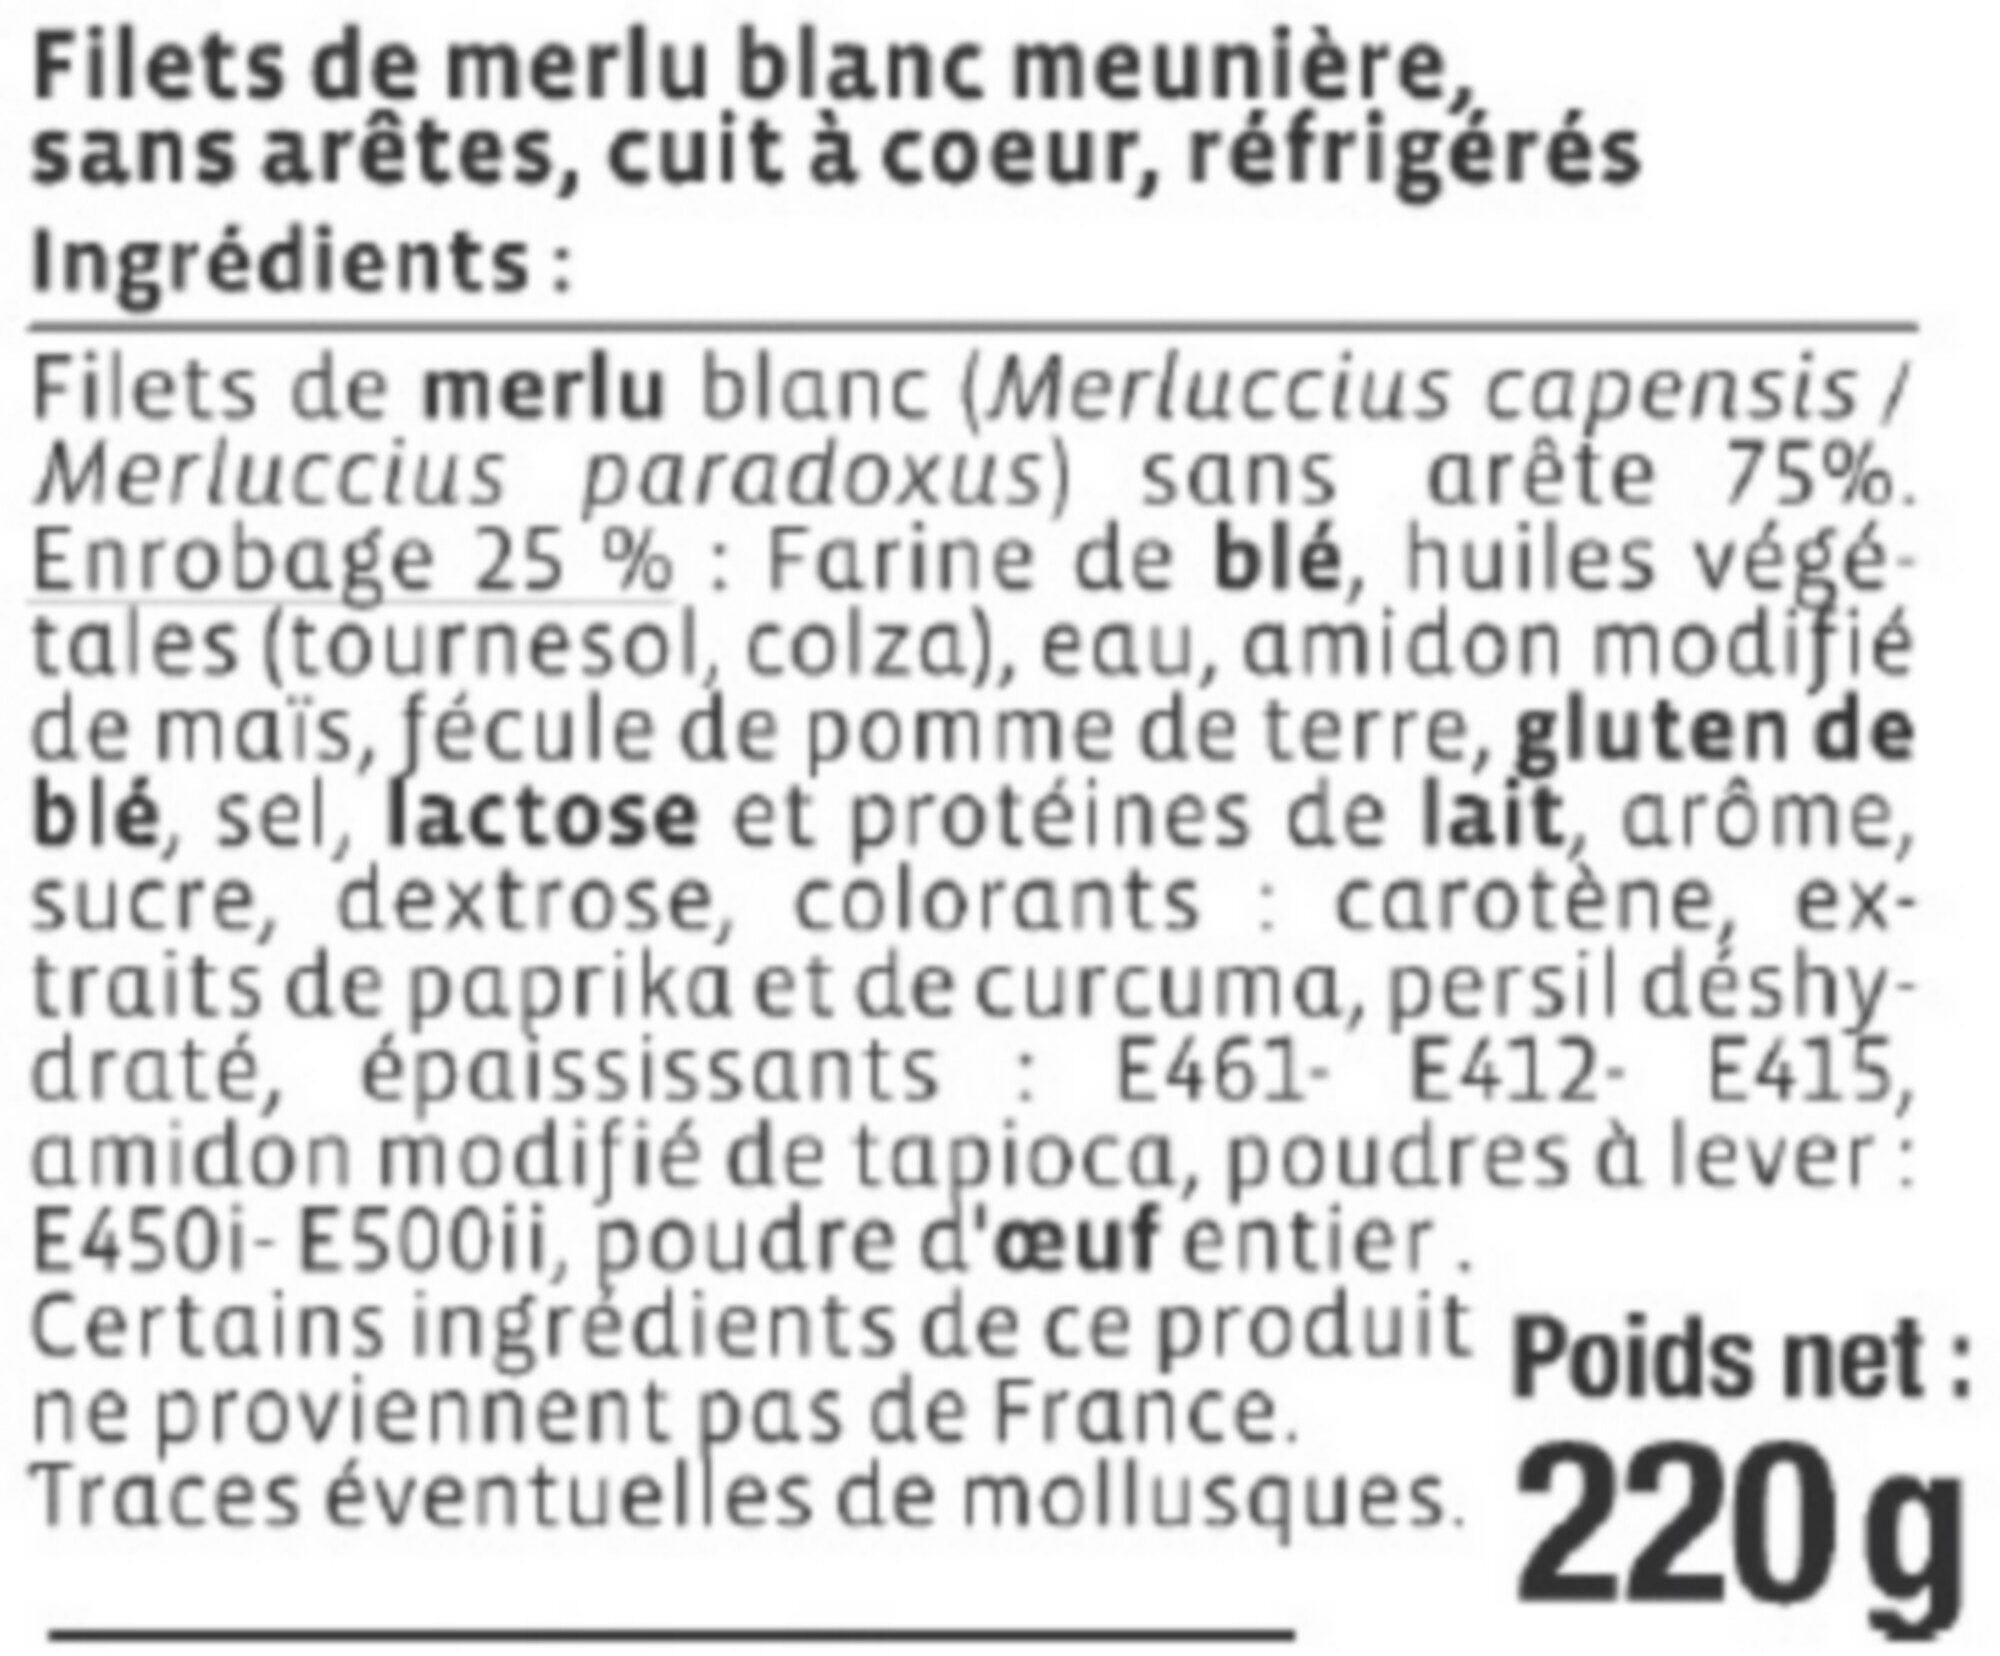 Filet de merlu blanc meunière, - Ingredients